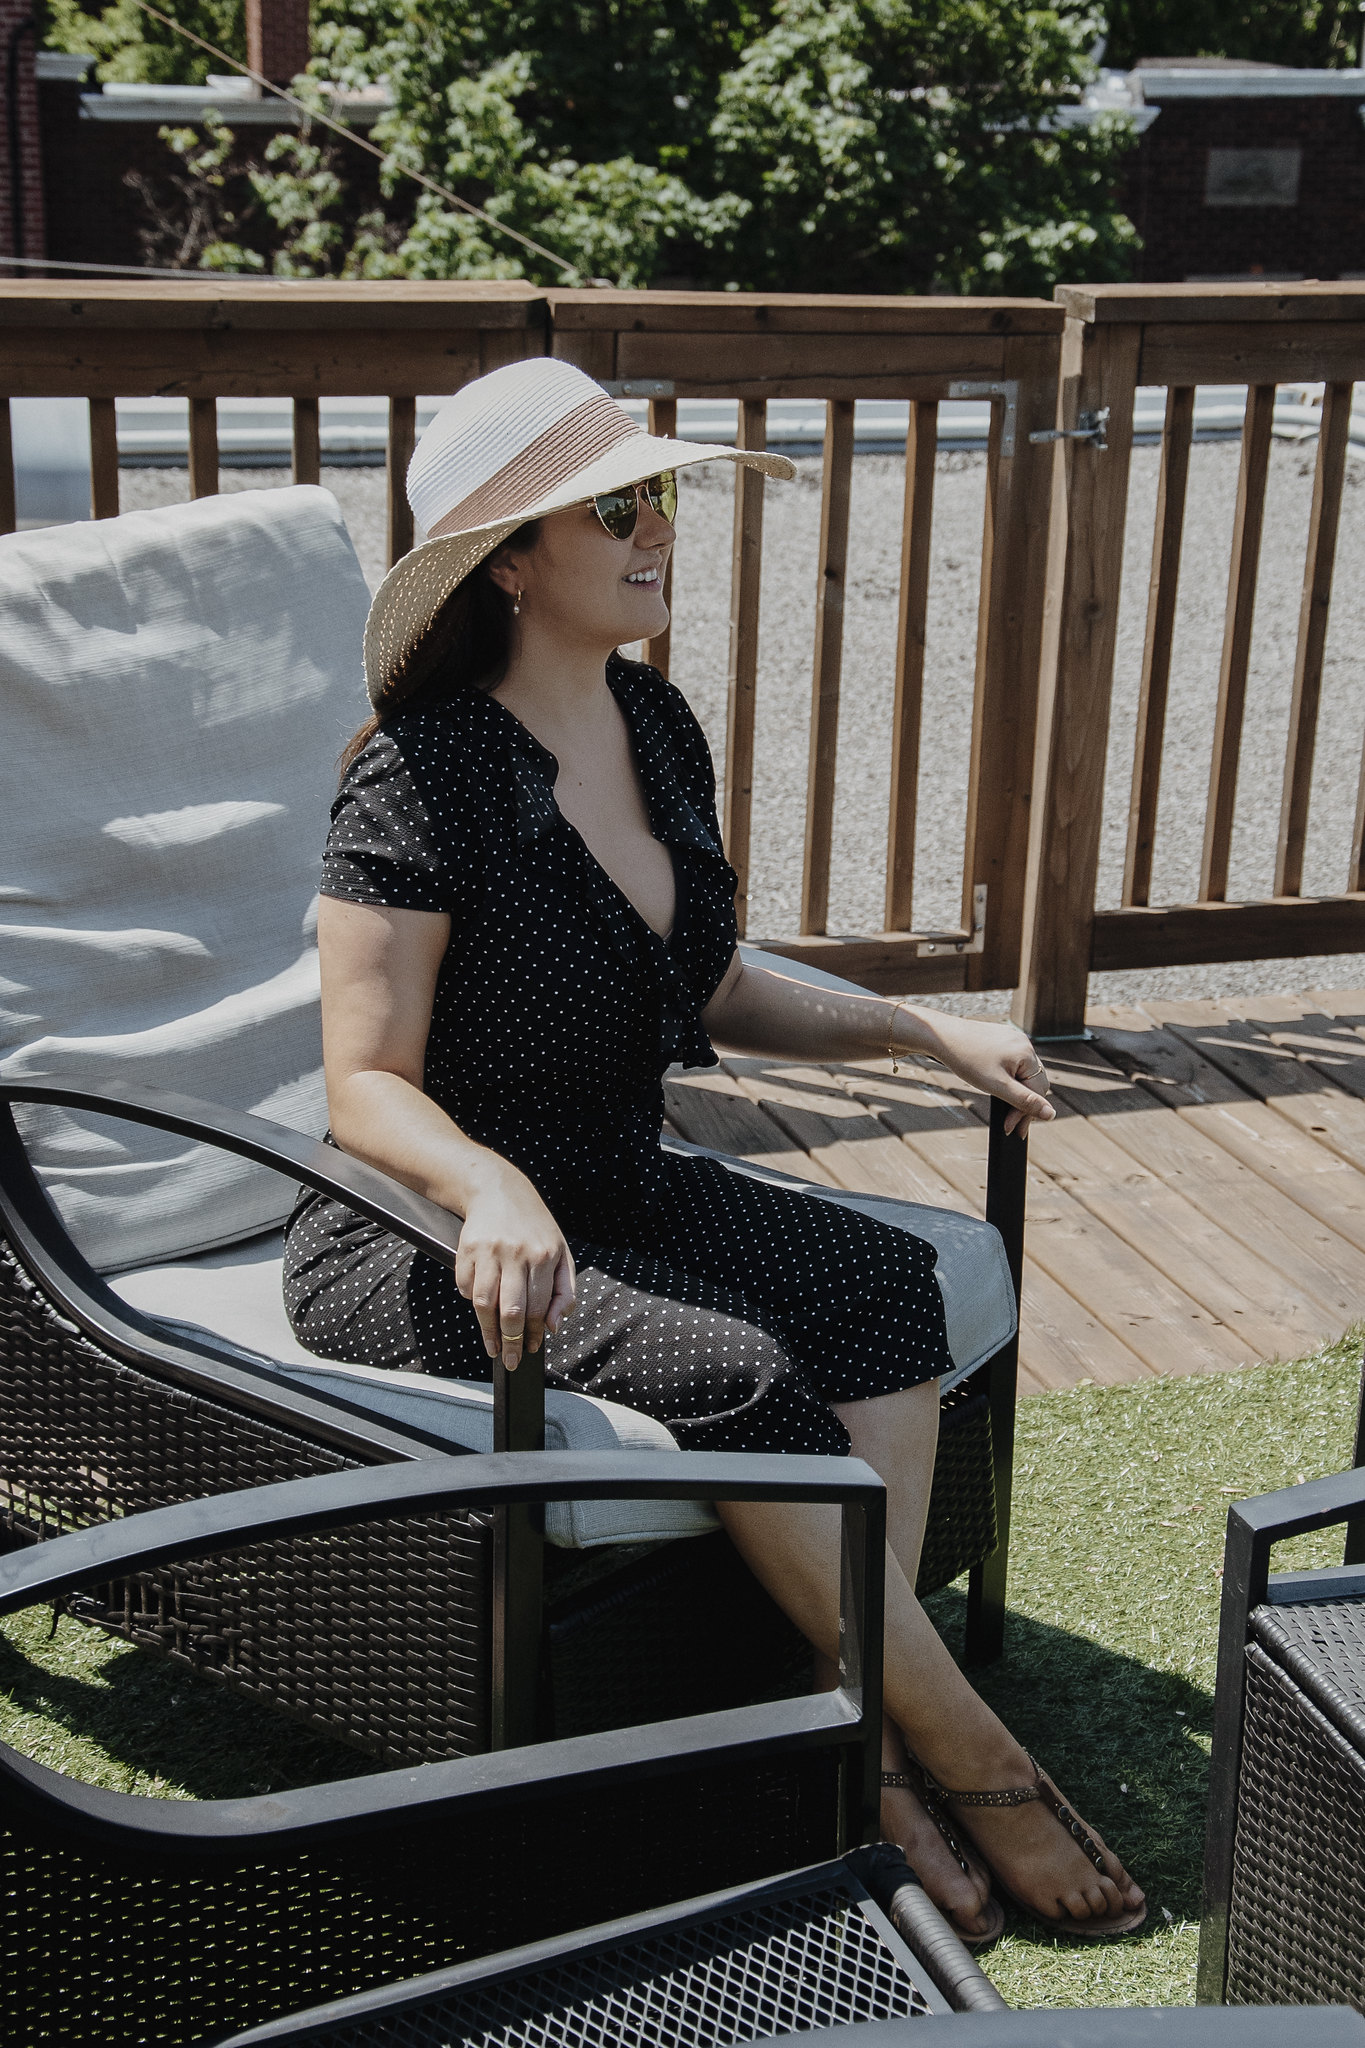 marie-chloe falardeau une-piece gros chapeau